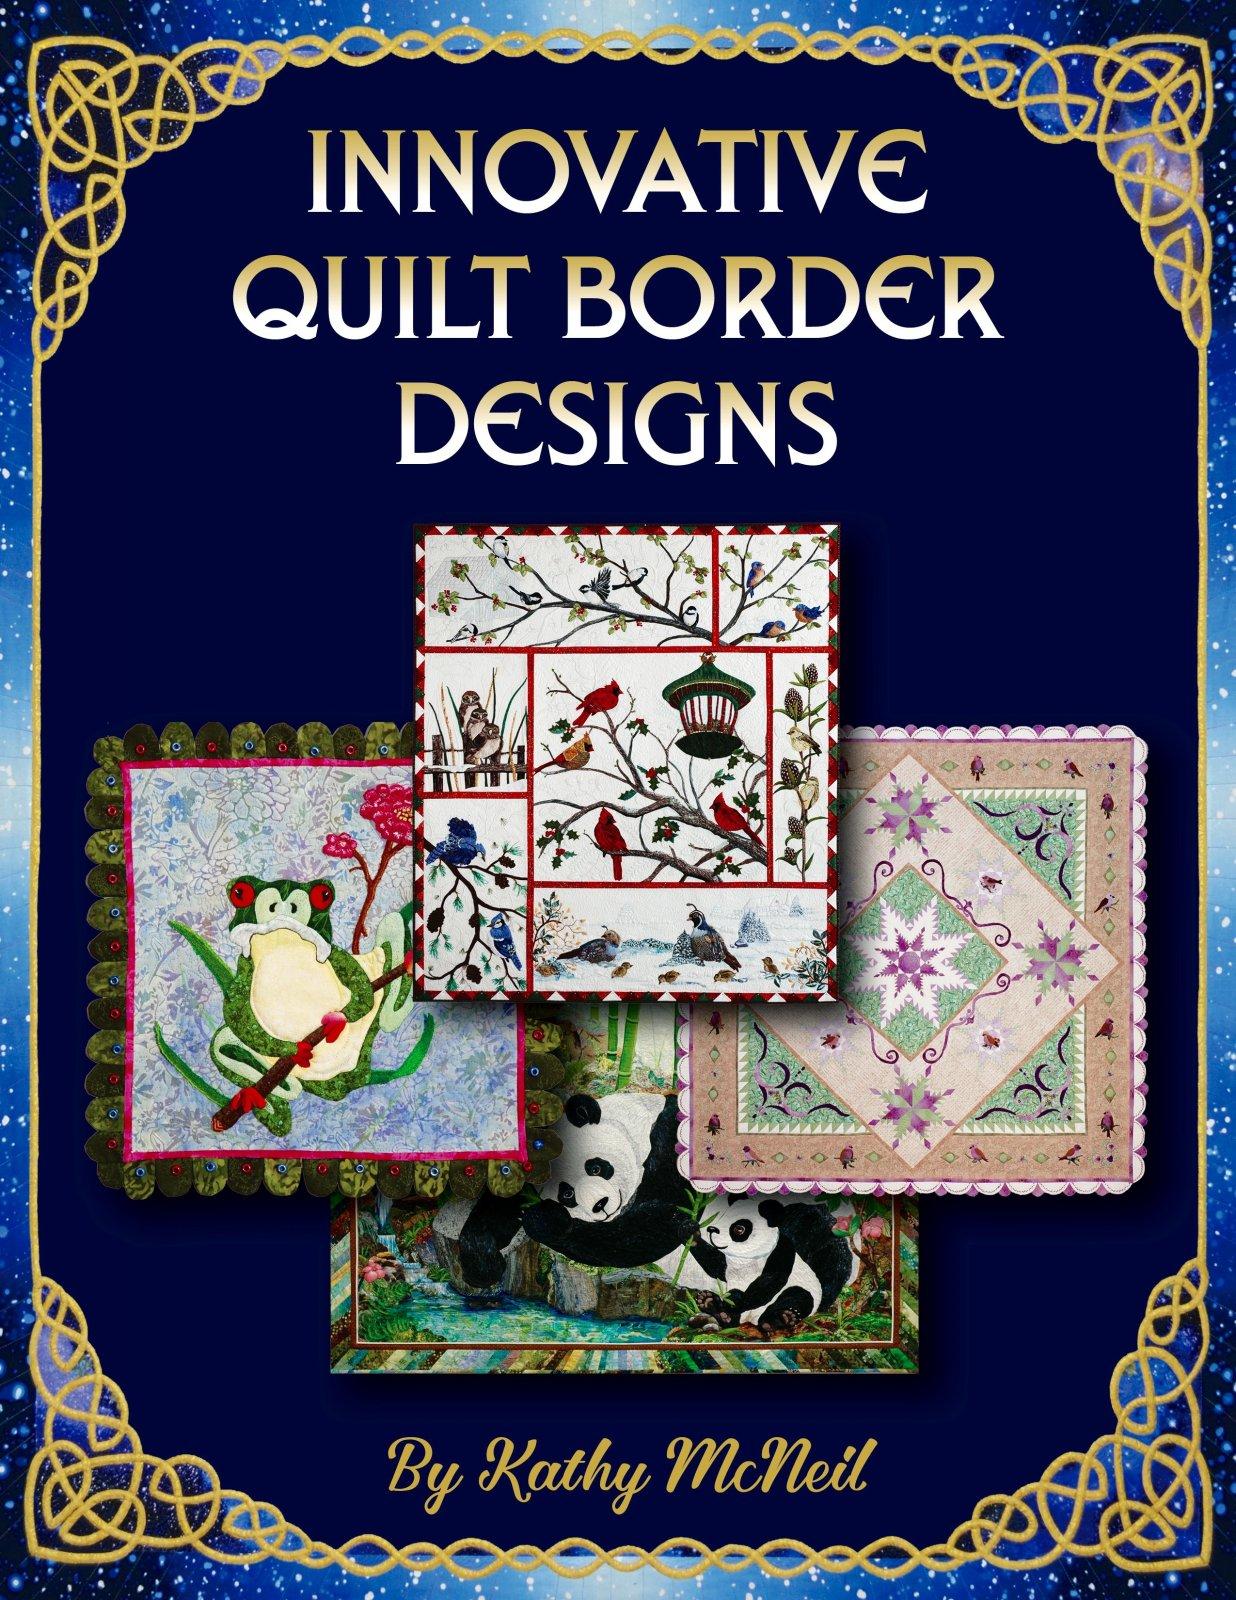 Innovative Quilt Borders, Digital copy